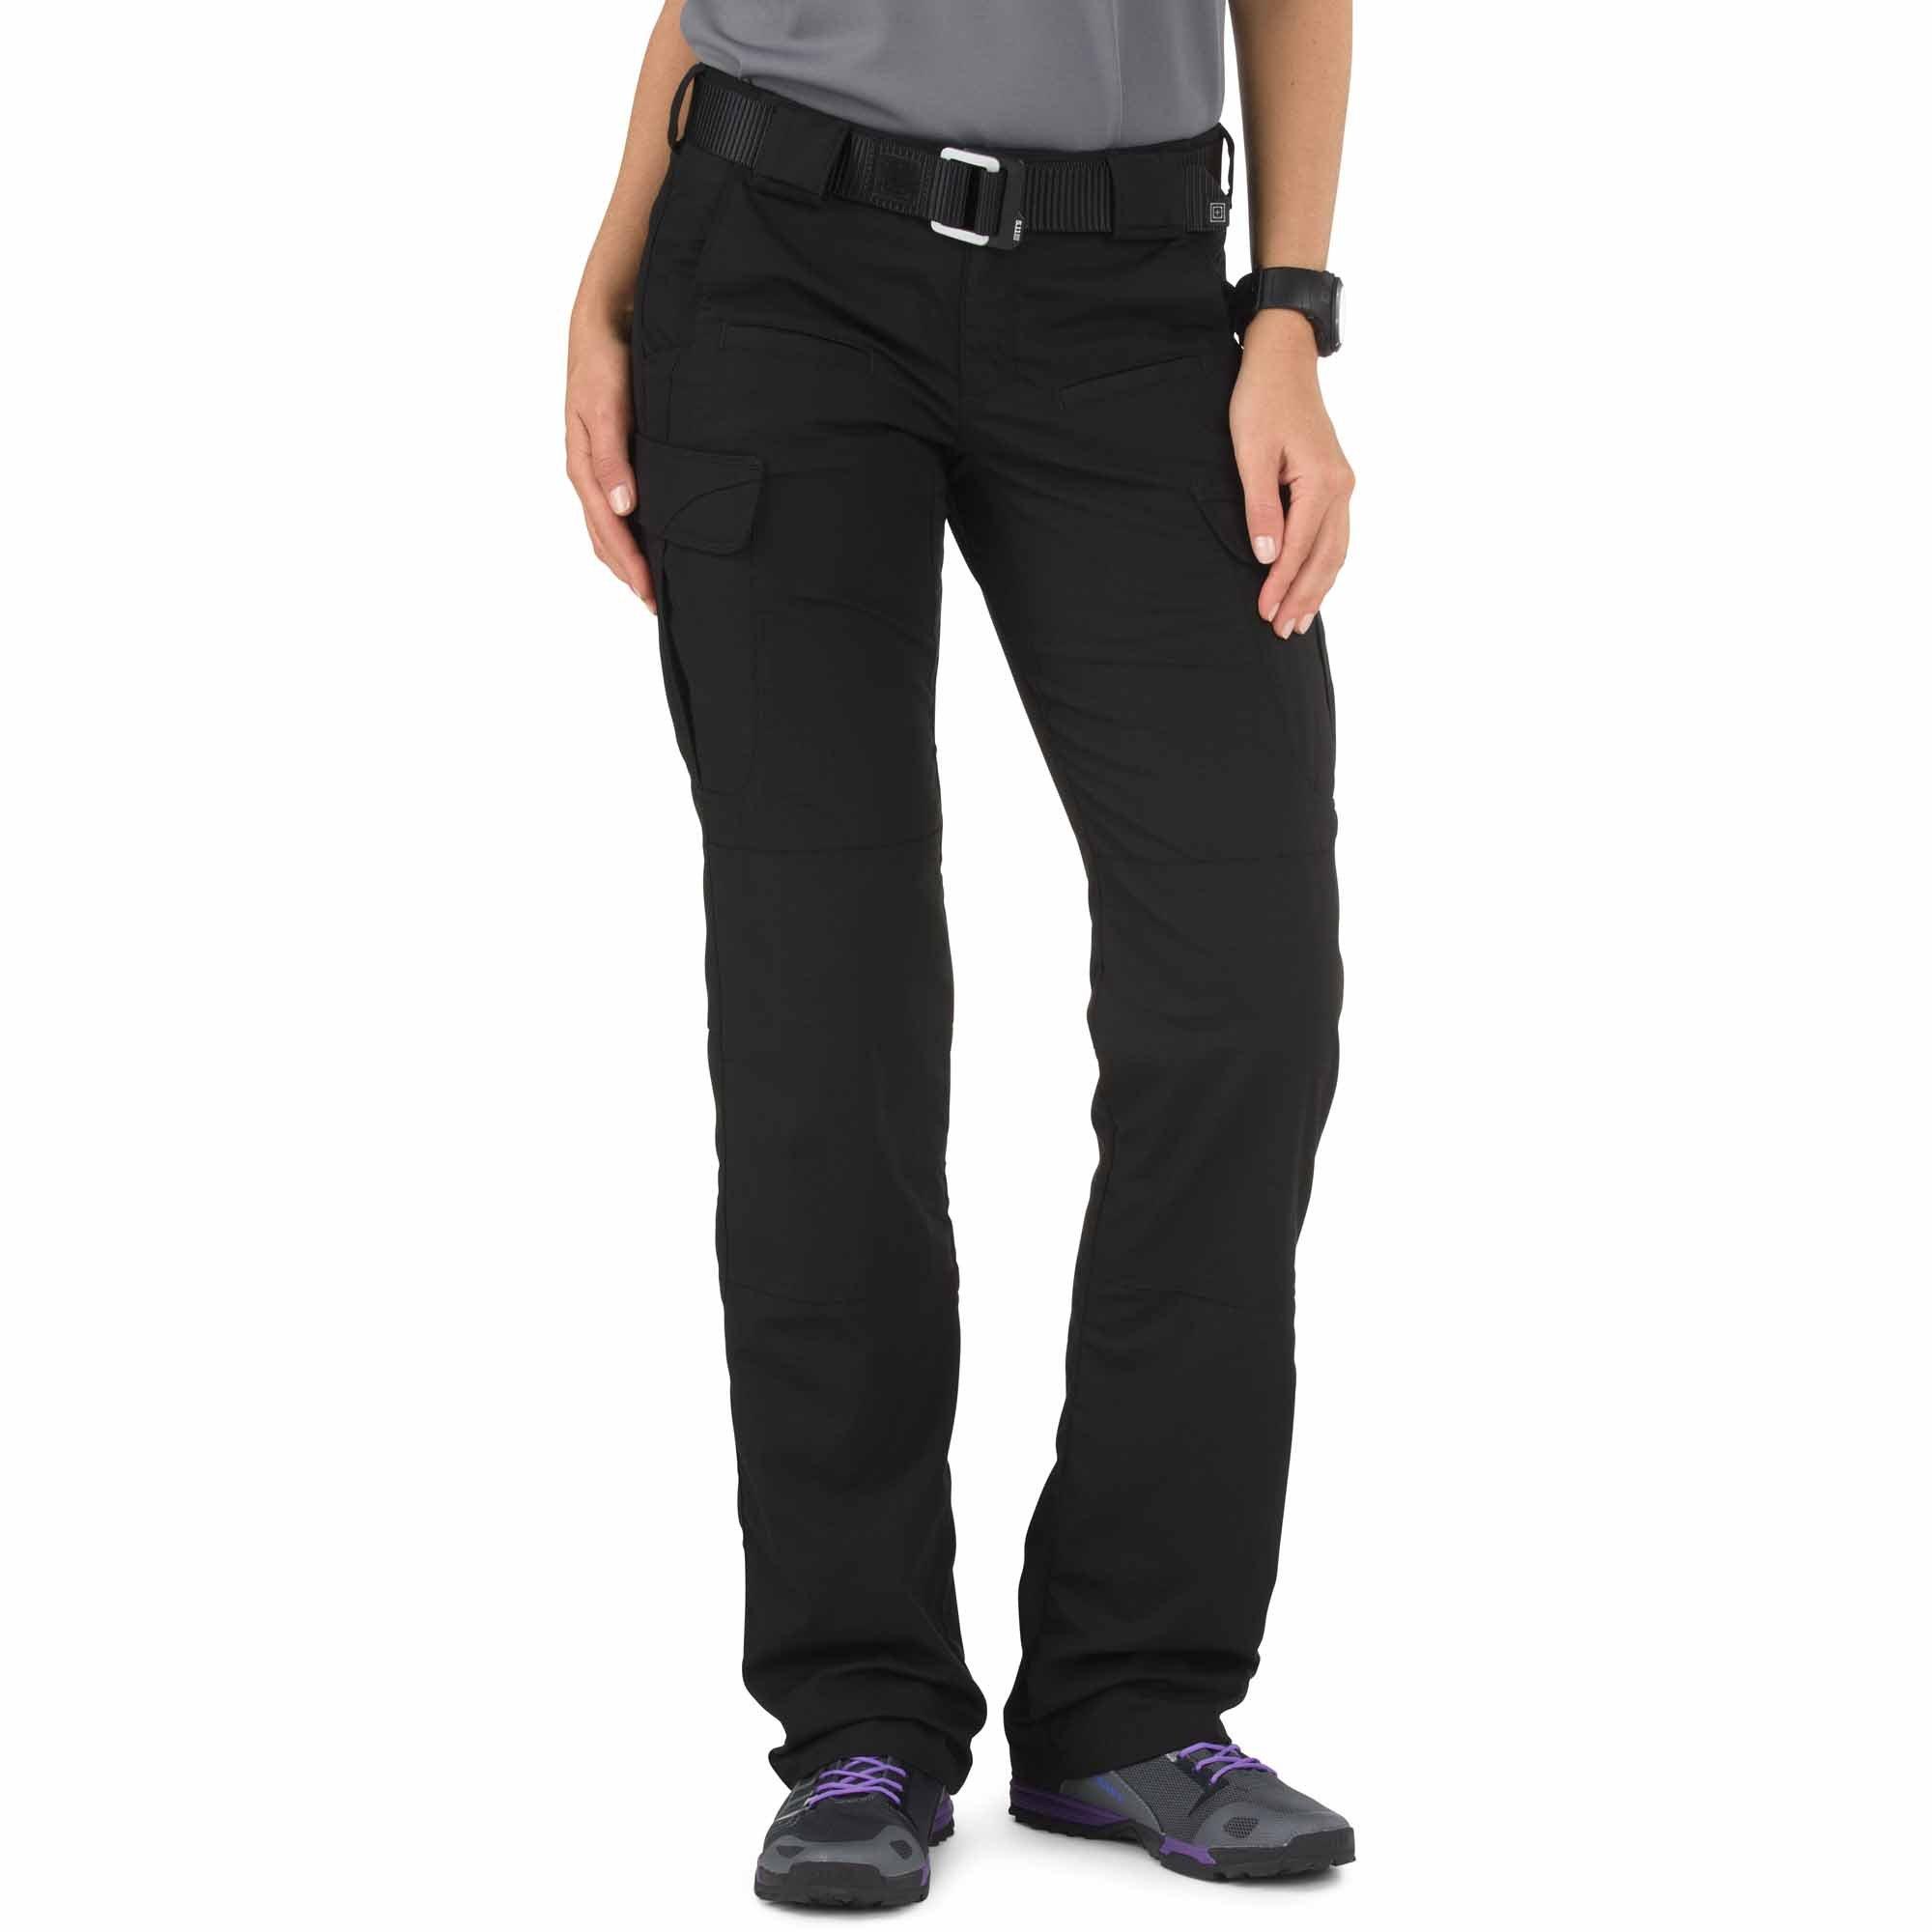 5.11 Tactical Women's Stryke Pant, Black, 8 R